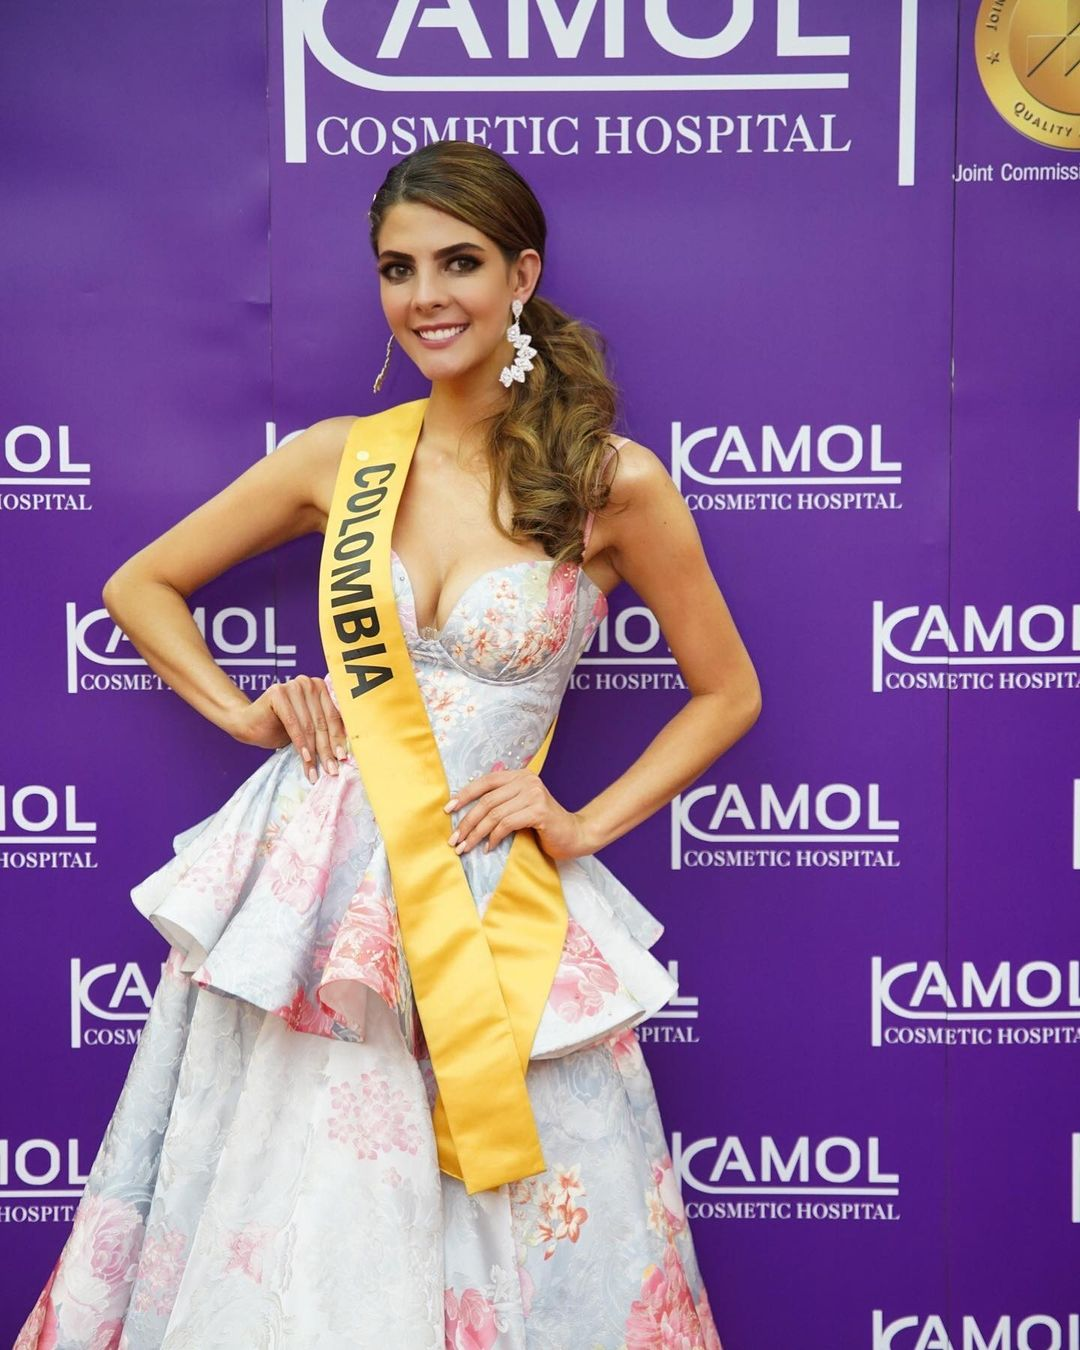 natalia manrique, miss grand colombia 2020. - Página 12 Dc3nt10